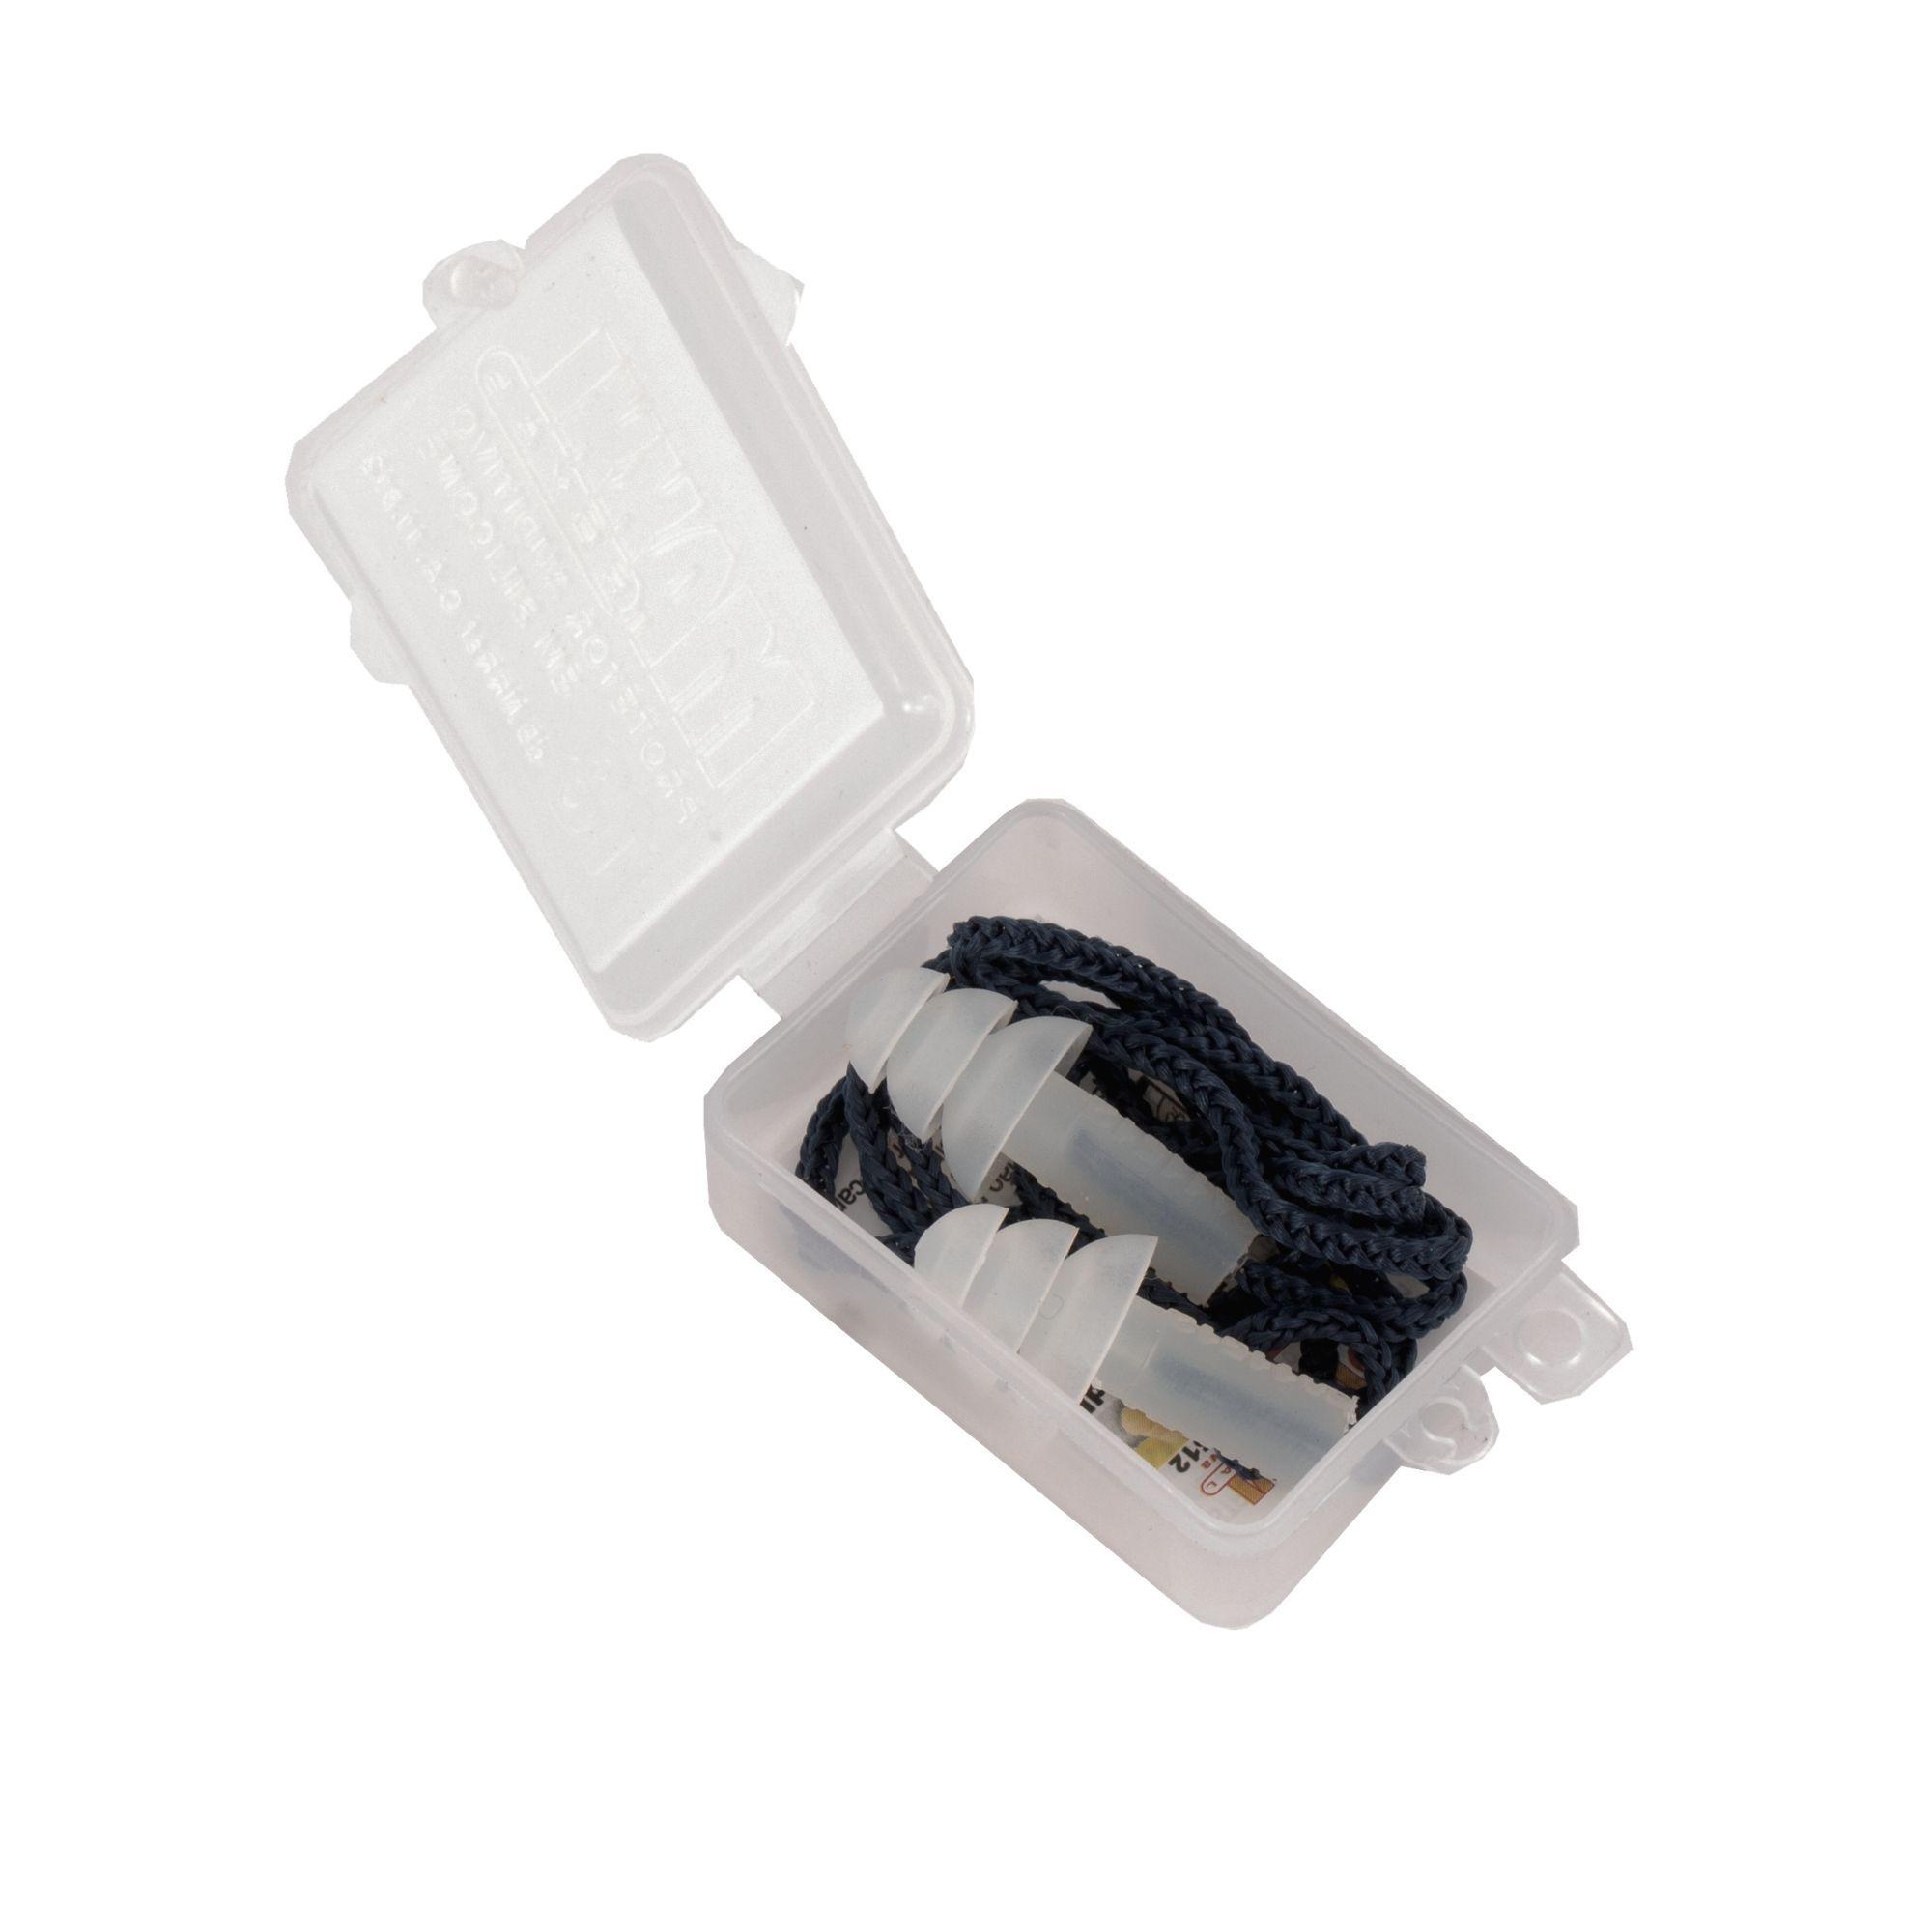 Kit 5 Pç Protetor Plug Auricular Ouvido Silicone Maxxi Royal  - DE PAULA EPI